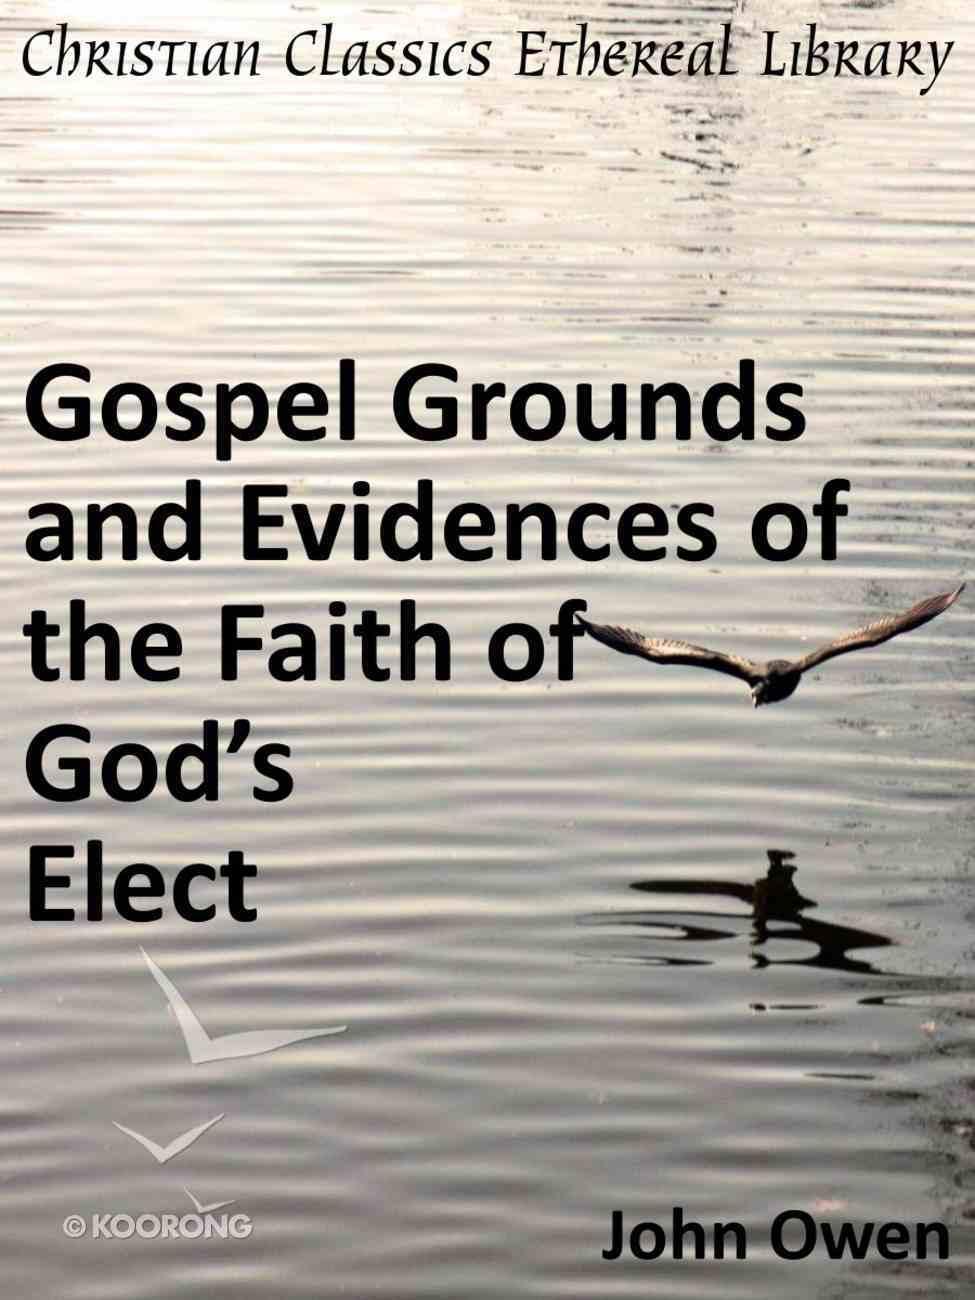 Gospel Grounds and Evidences of the Faith of God's Elect eBook